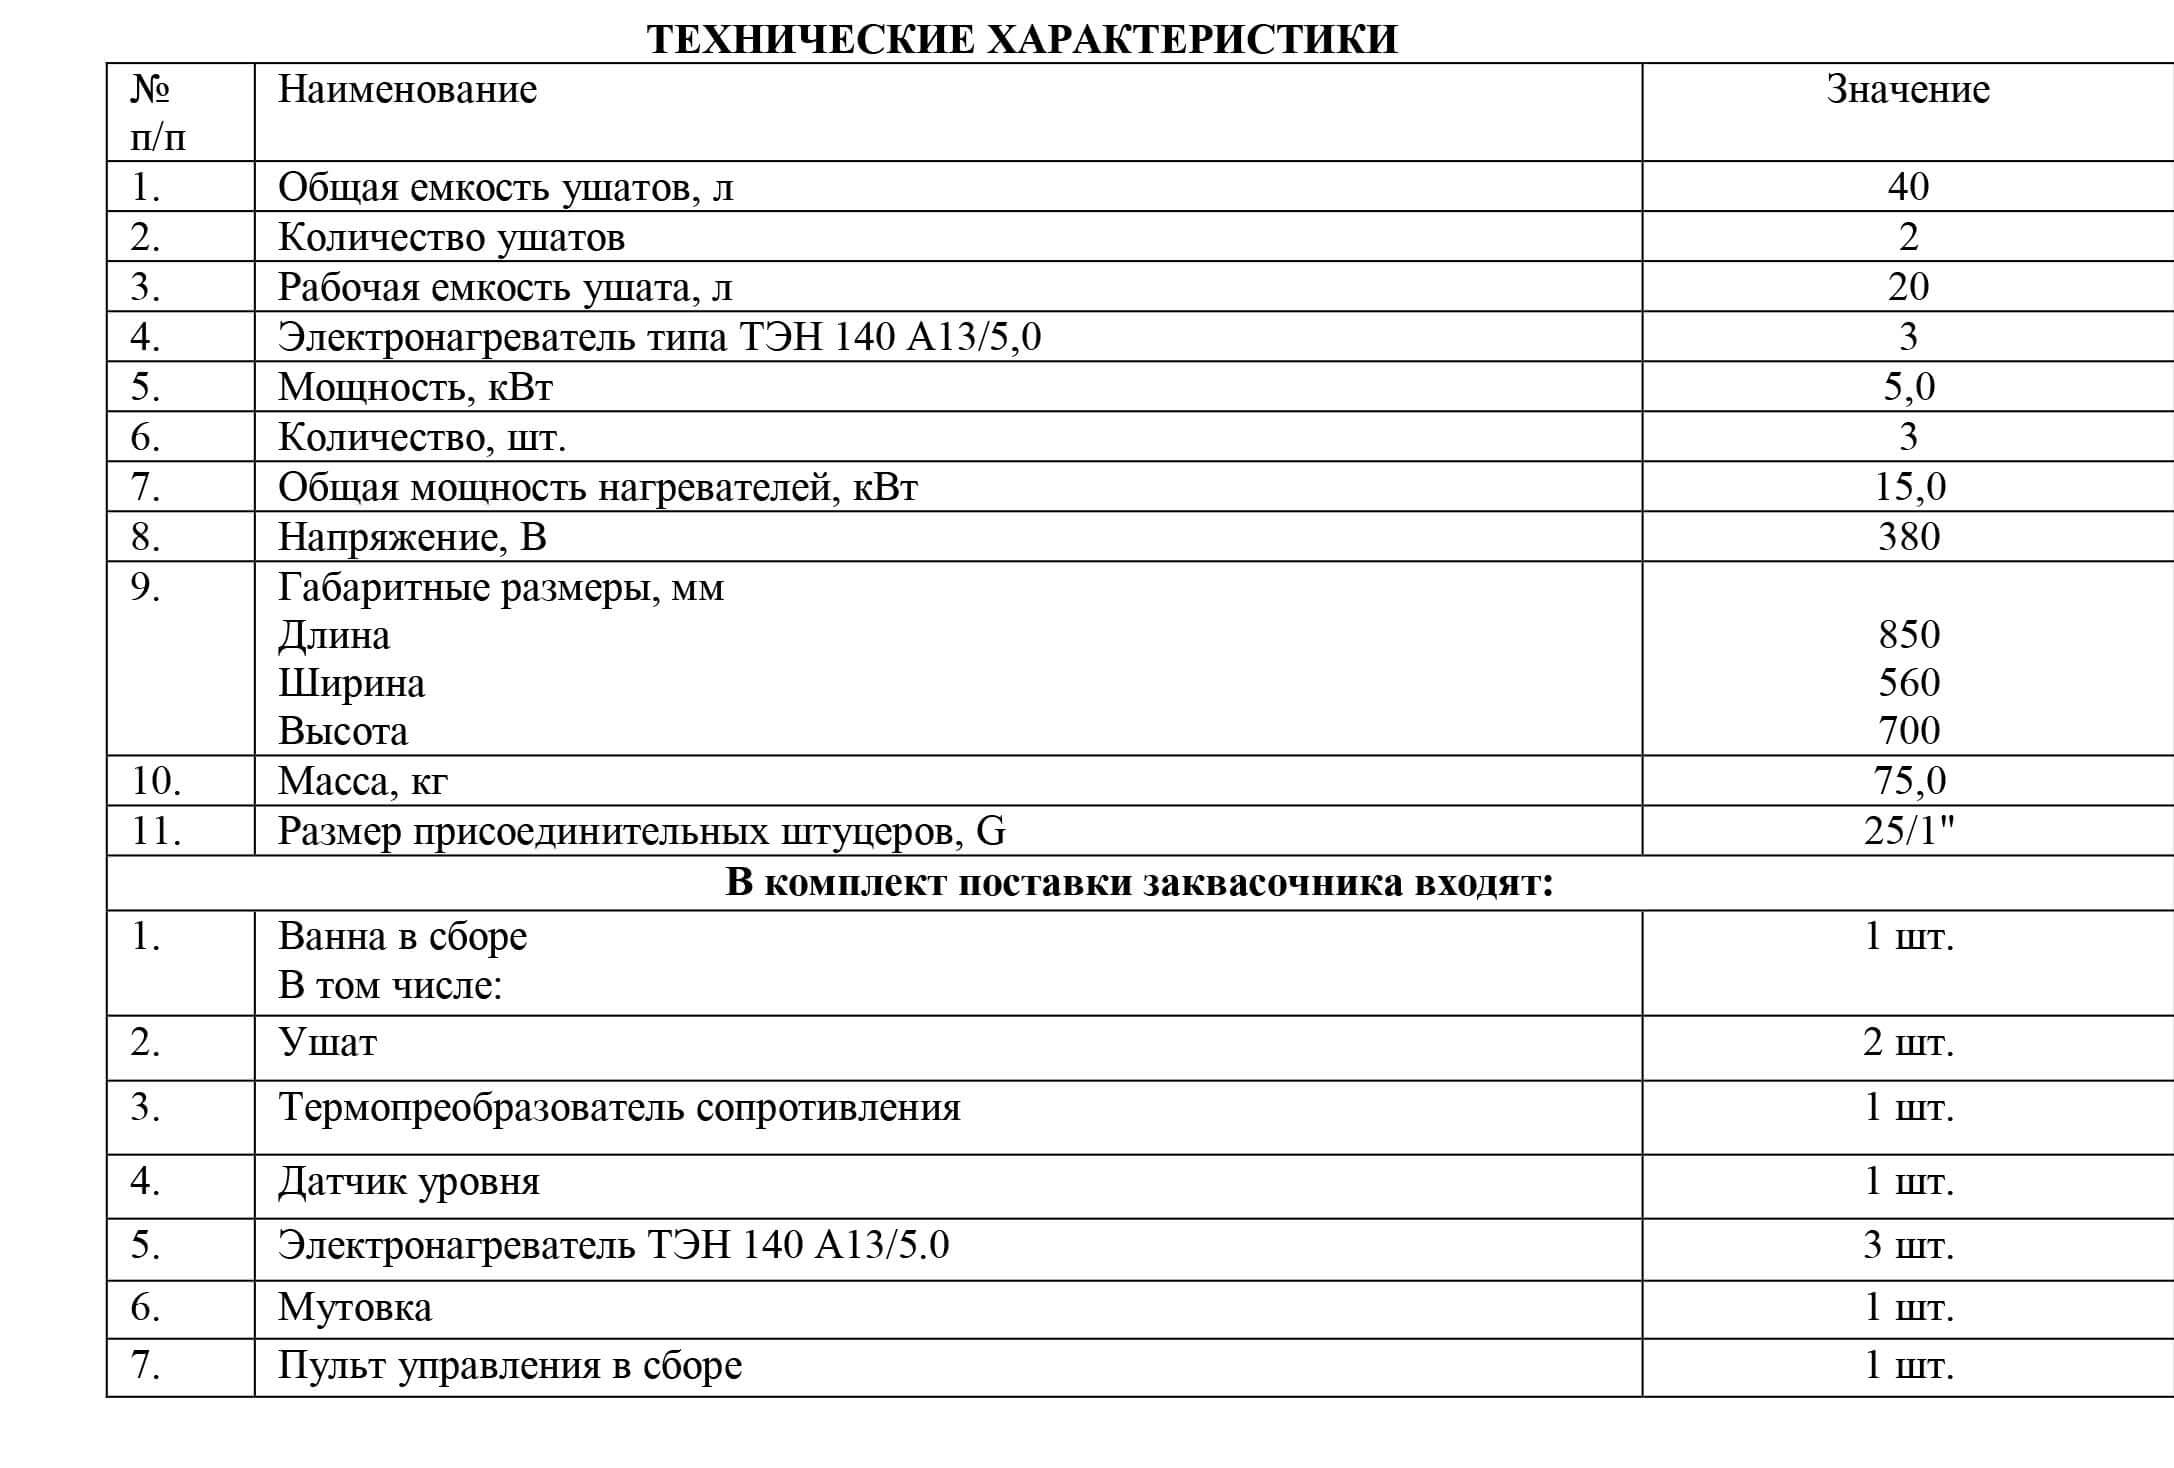 Технические характеристики заквасочника